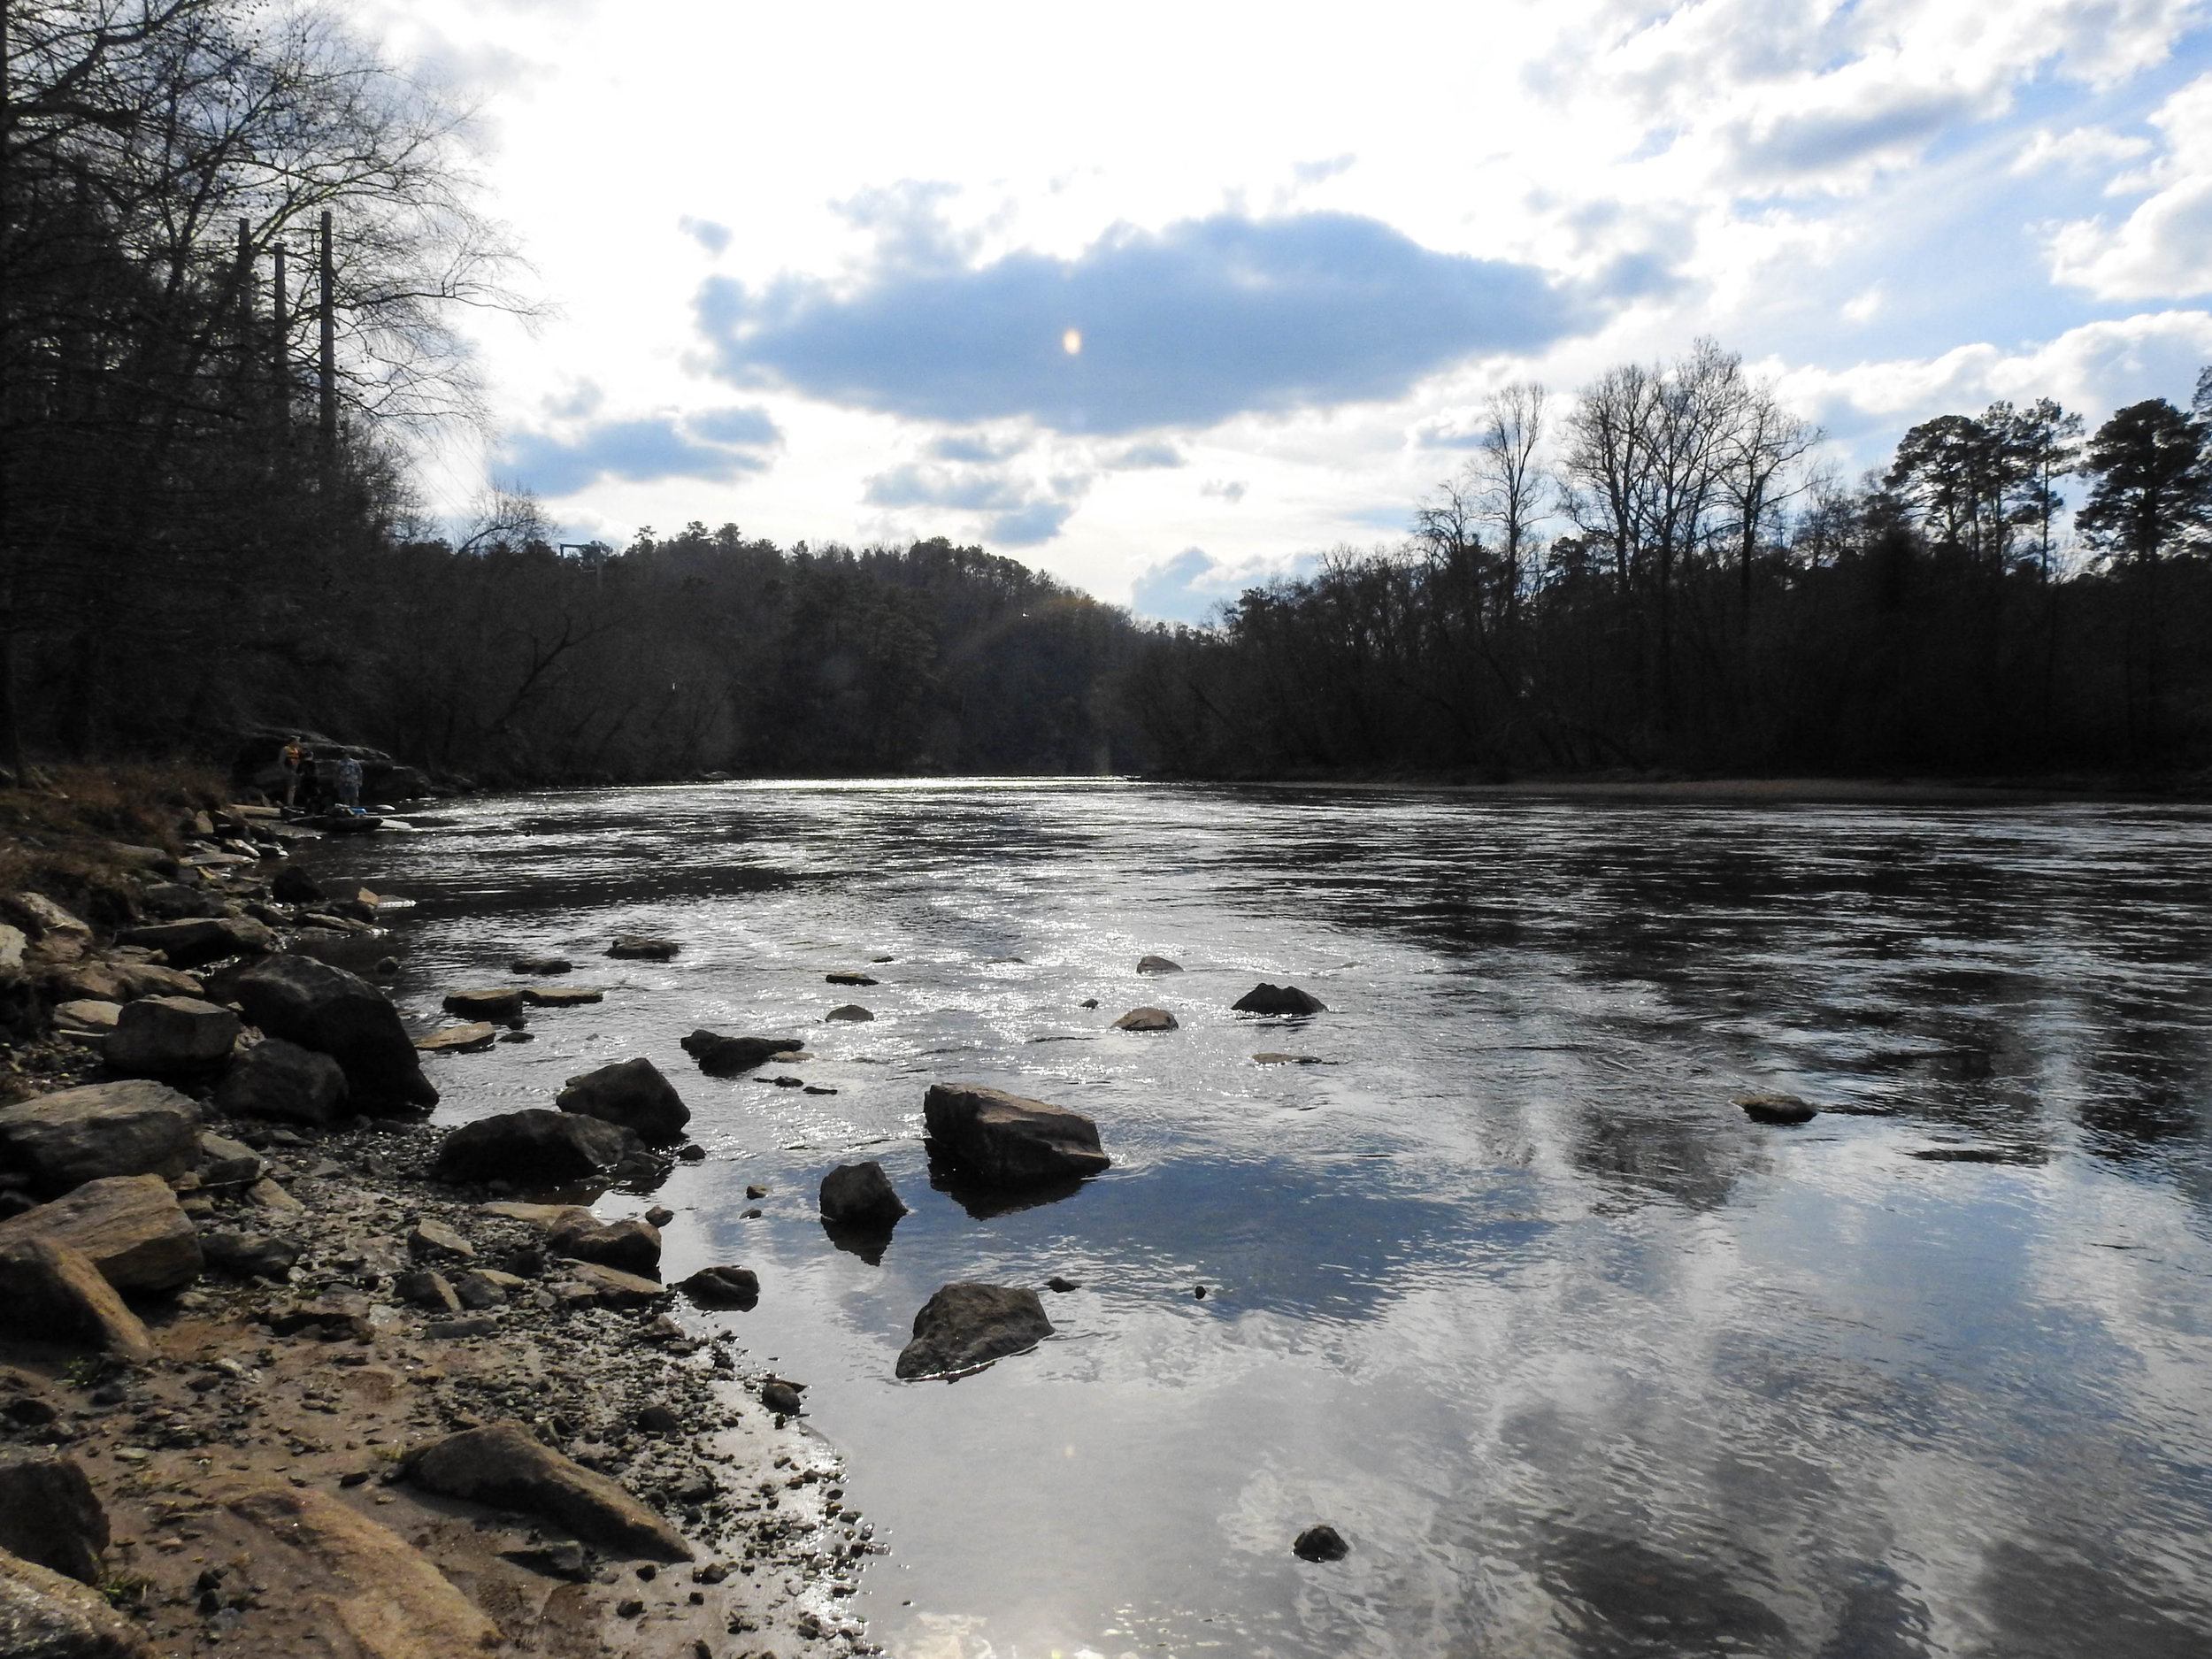 River Park, January 15, 2017